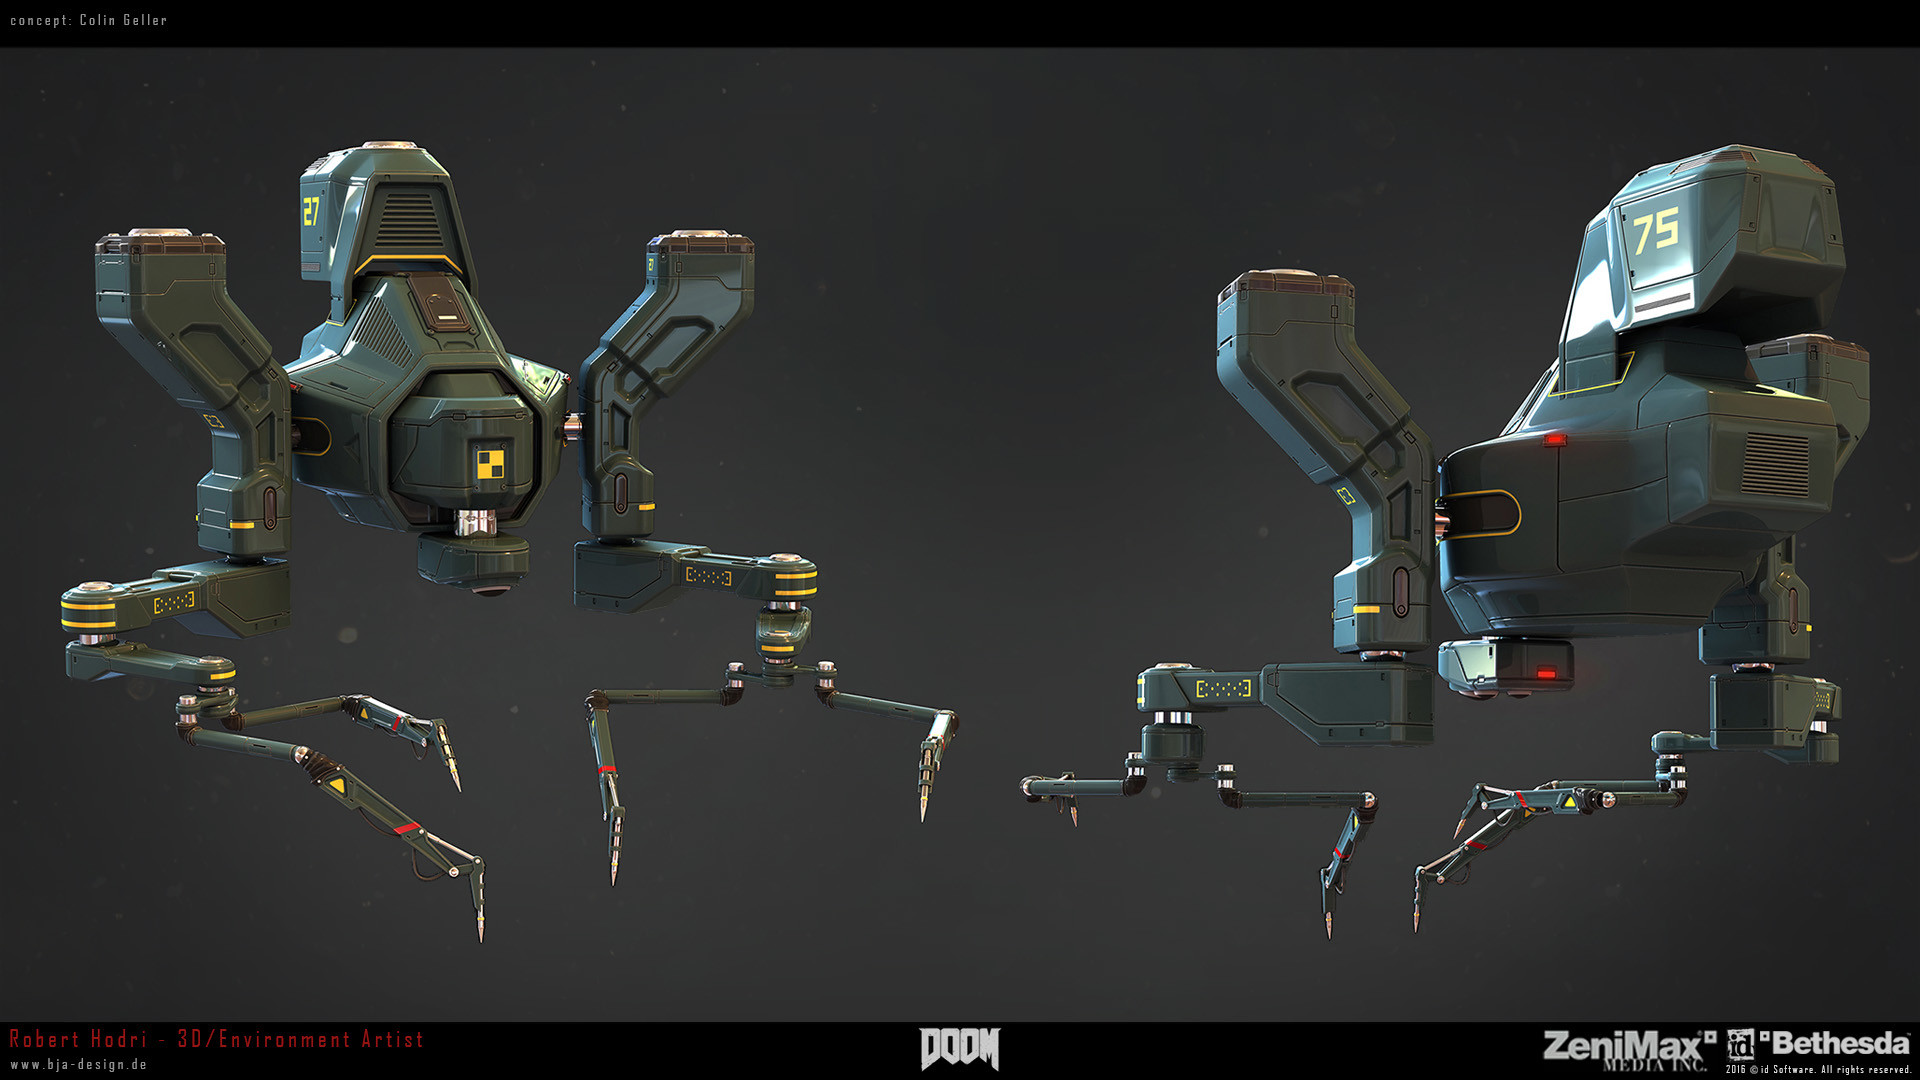 robert-hodri-surgery-bot.jpg